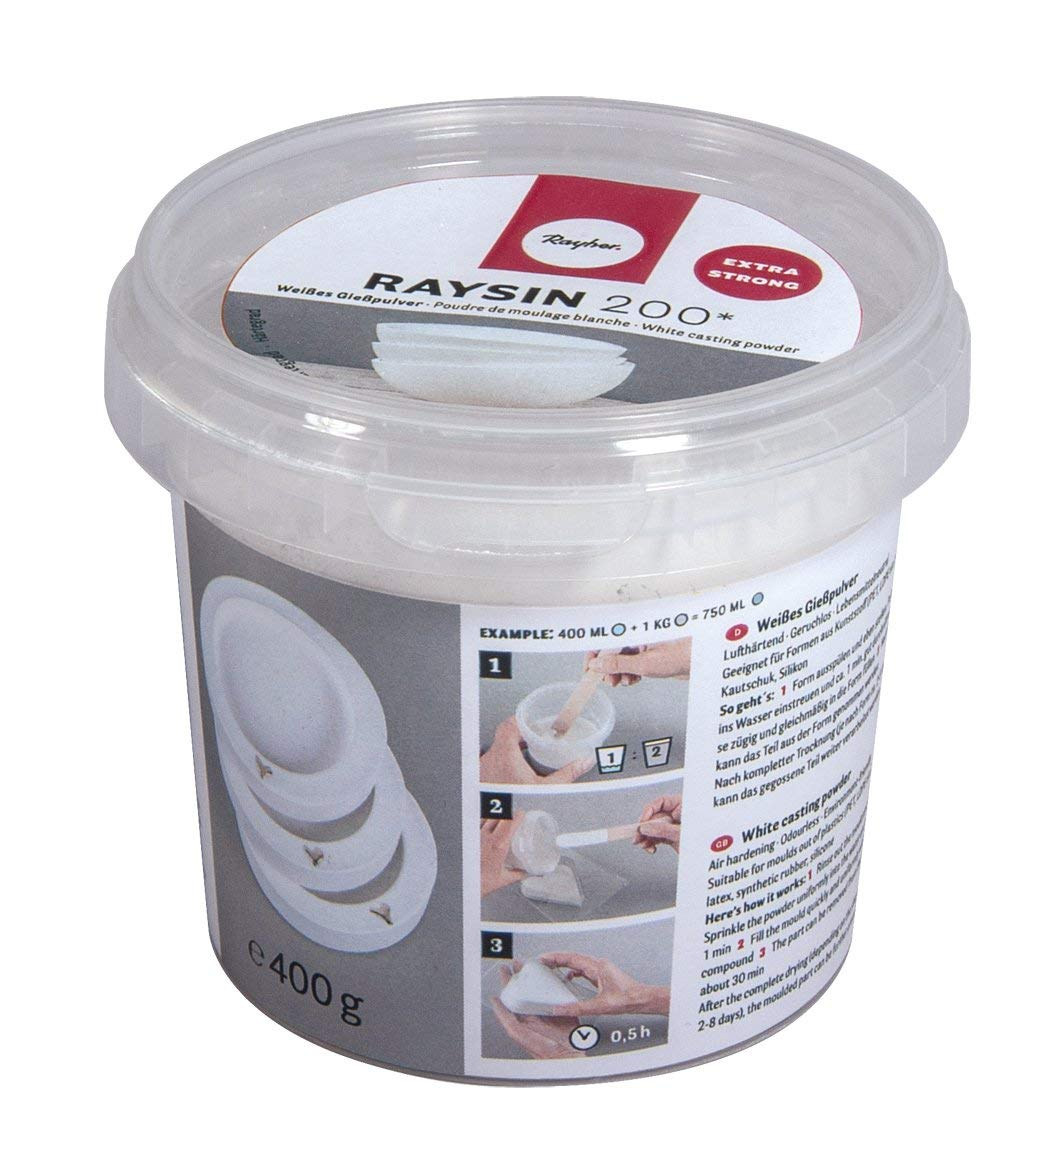 Blanc 9,5/x 9,5/x 8,6/cm 6/unit/és de Rayher Hobby Poudre /à mouler raysin 200